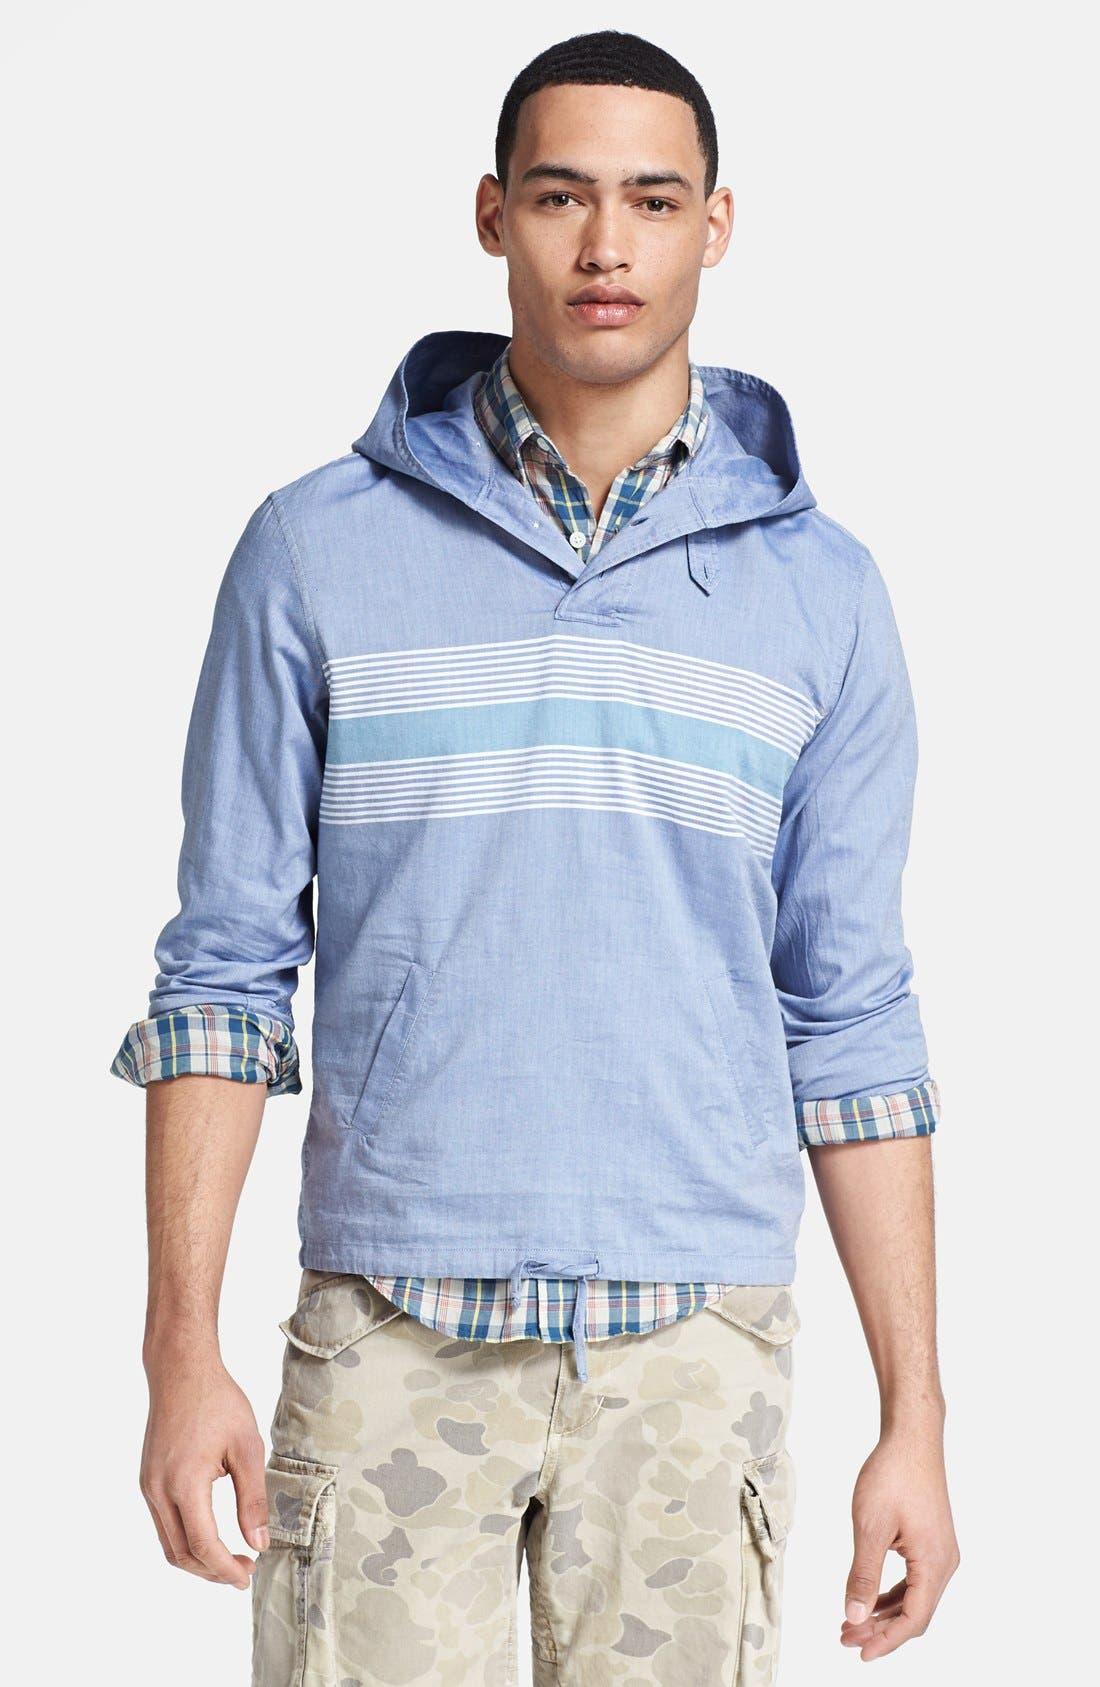 Alternate Image 1 Selected - Gant by Michael Bastian Chest Stripe Hooded Pullover Shirt